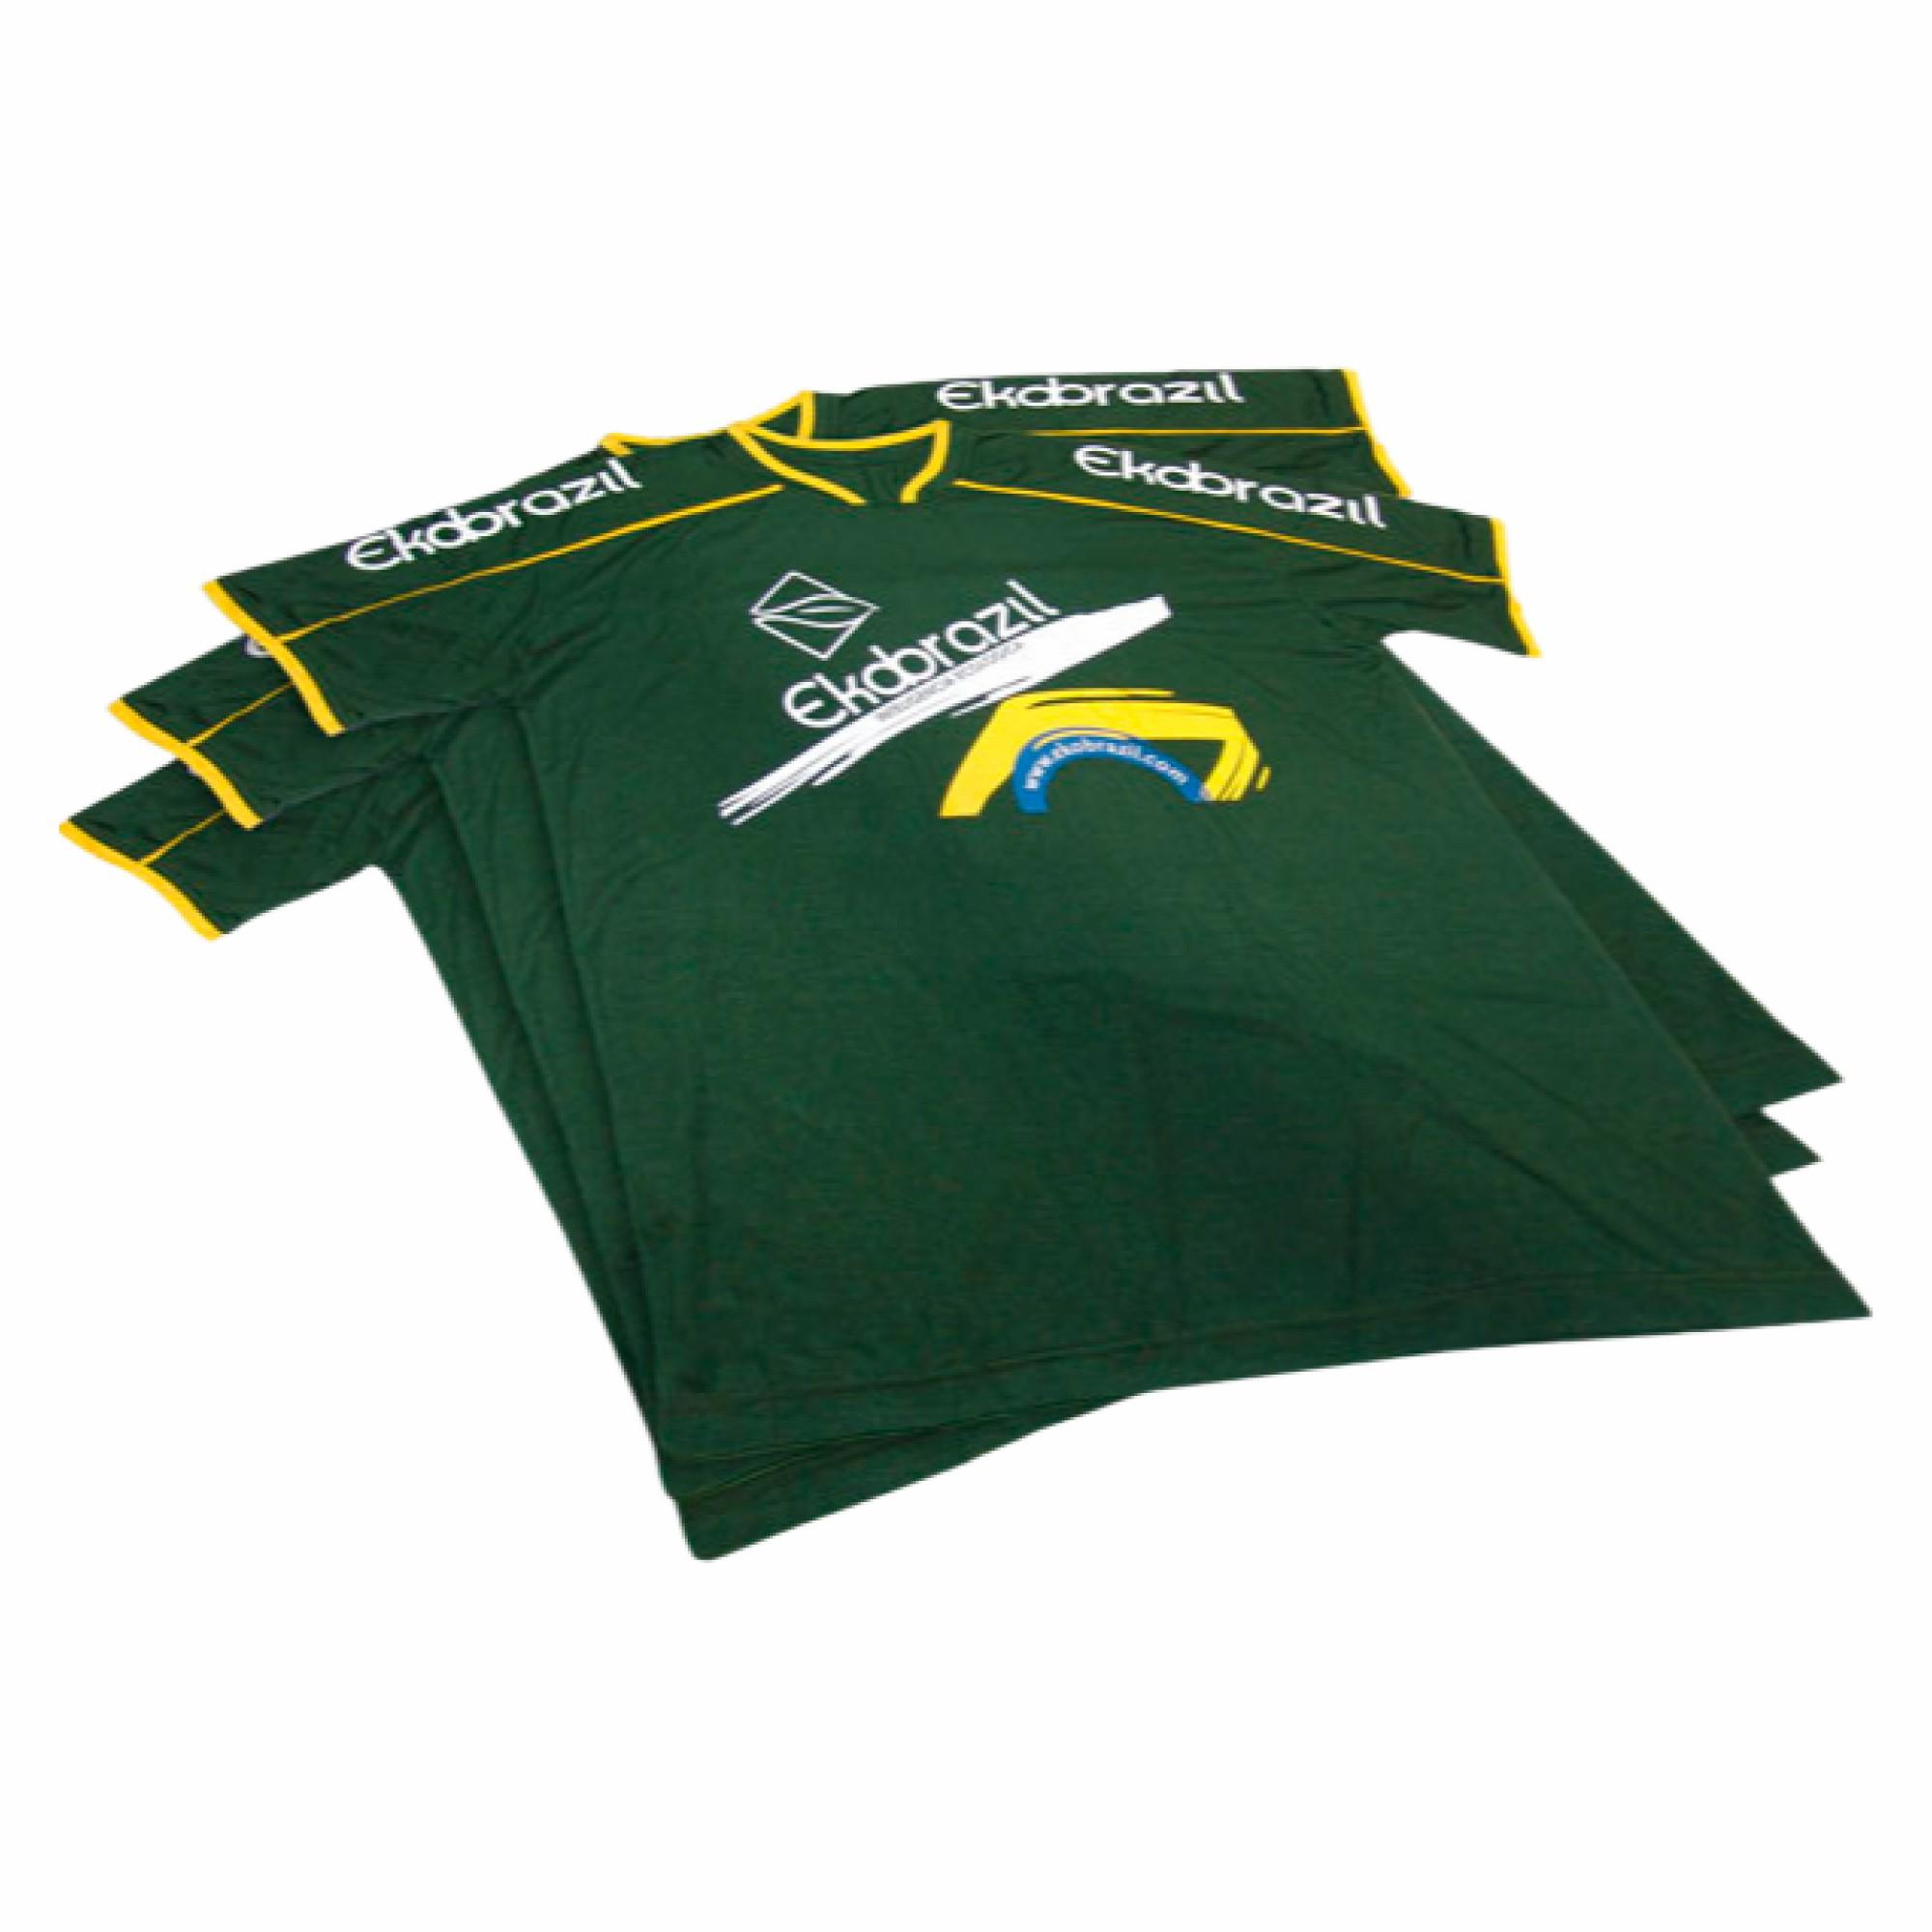 Comprar Camiseta Ekobrazil P